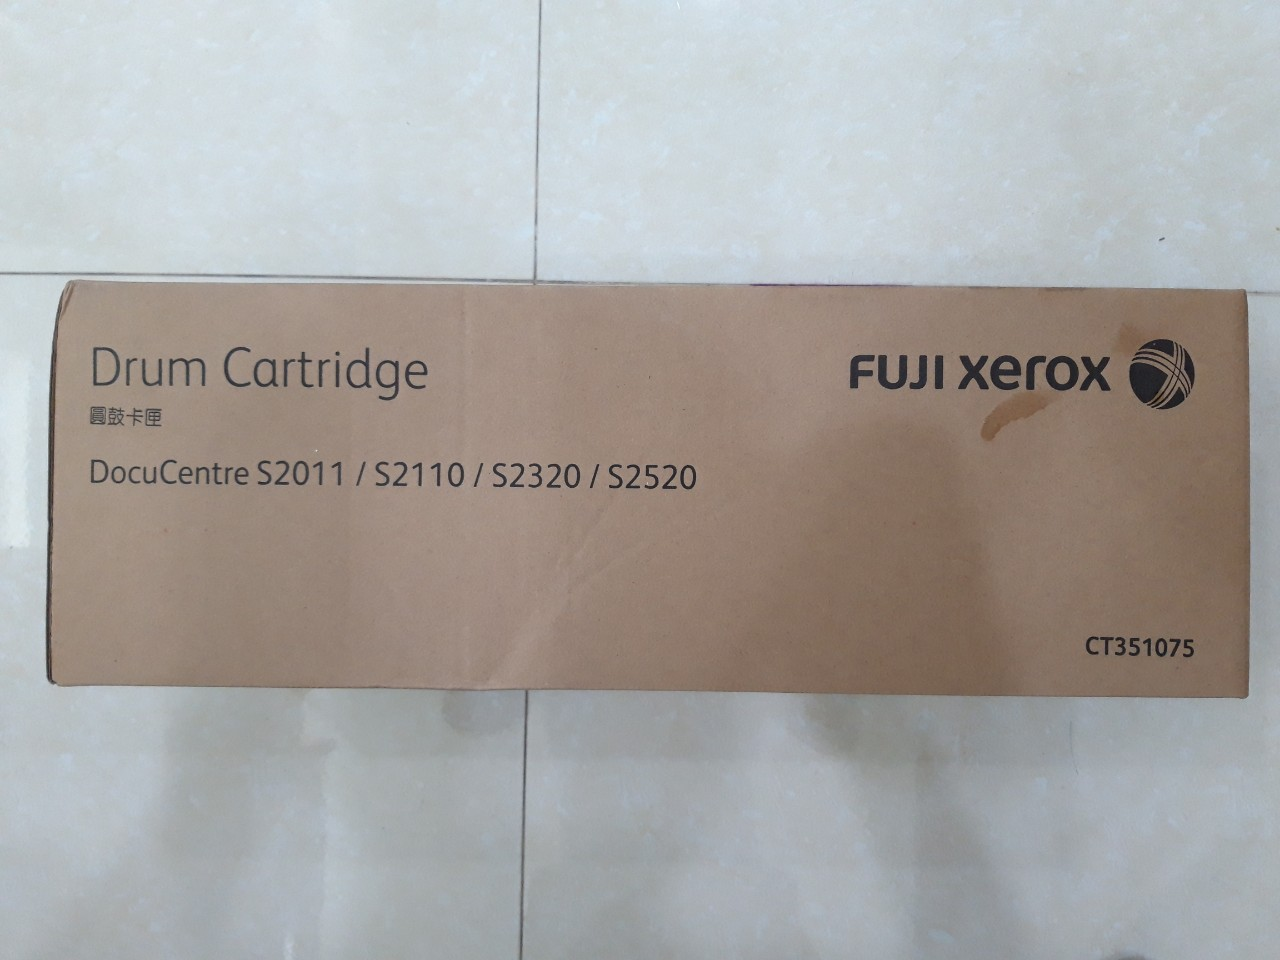 Drum Cartridge Xerox S2011 S2110 S2320 S2520